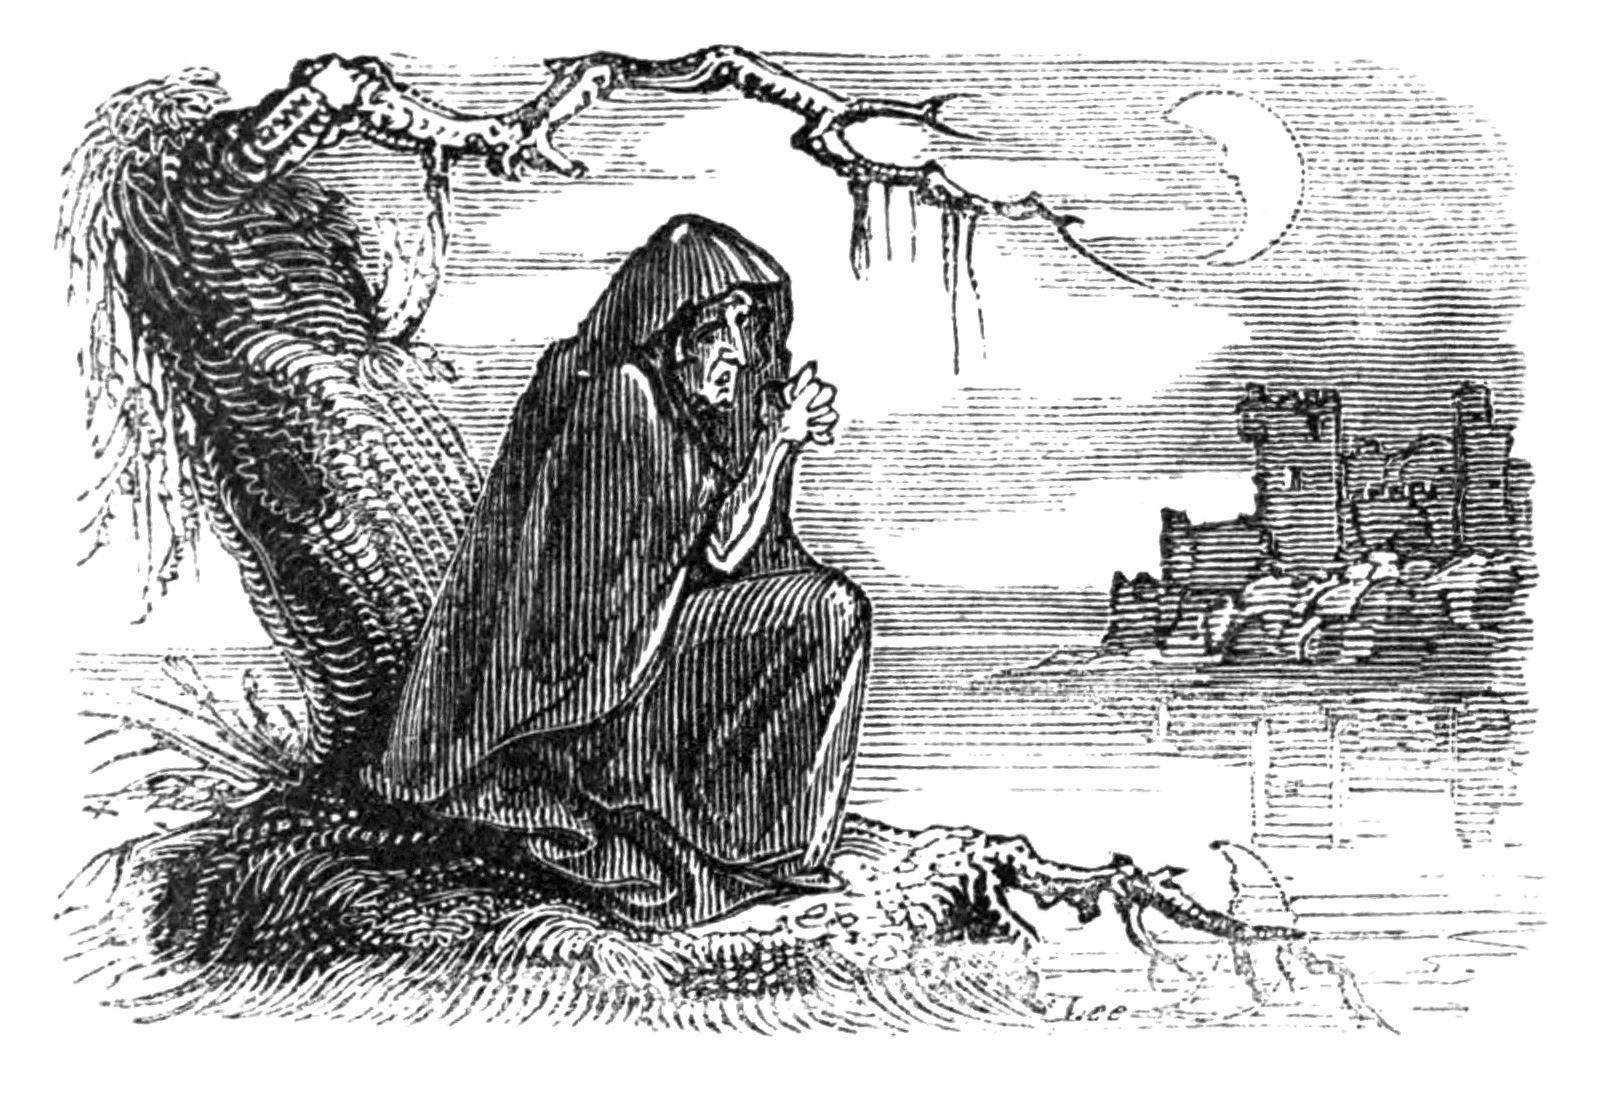 Imagen a tinta que representa a una banshee publicada en libro Fairy Legends and Traditions of the South of Ireland de Thomas Crofton Croker